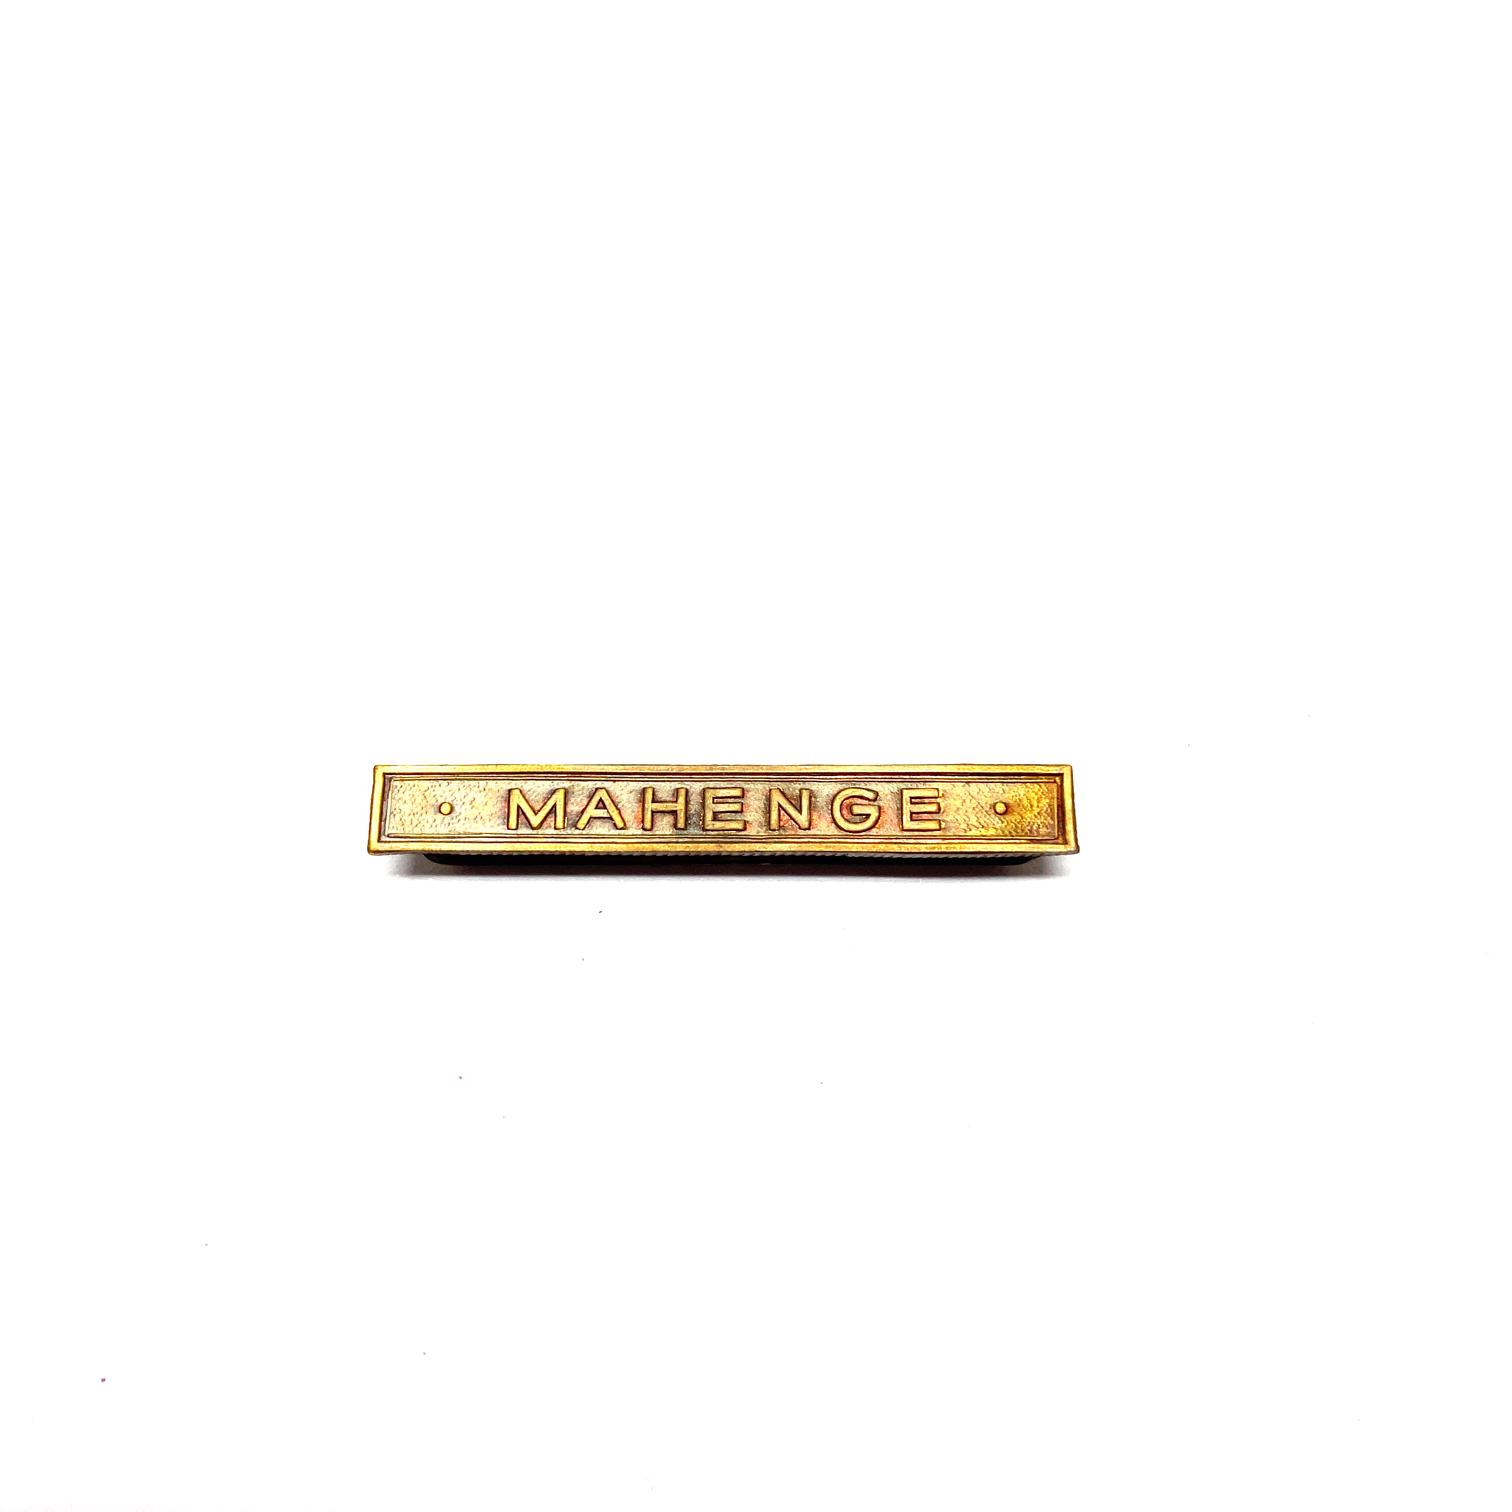 Bar Mahenge for war medals